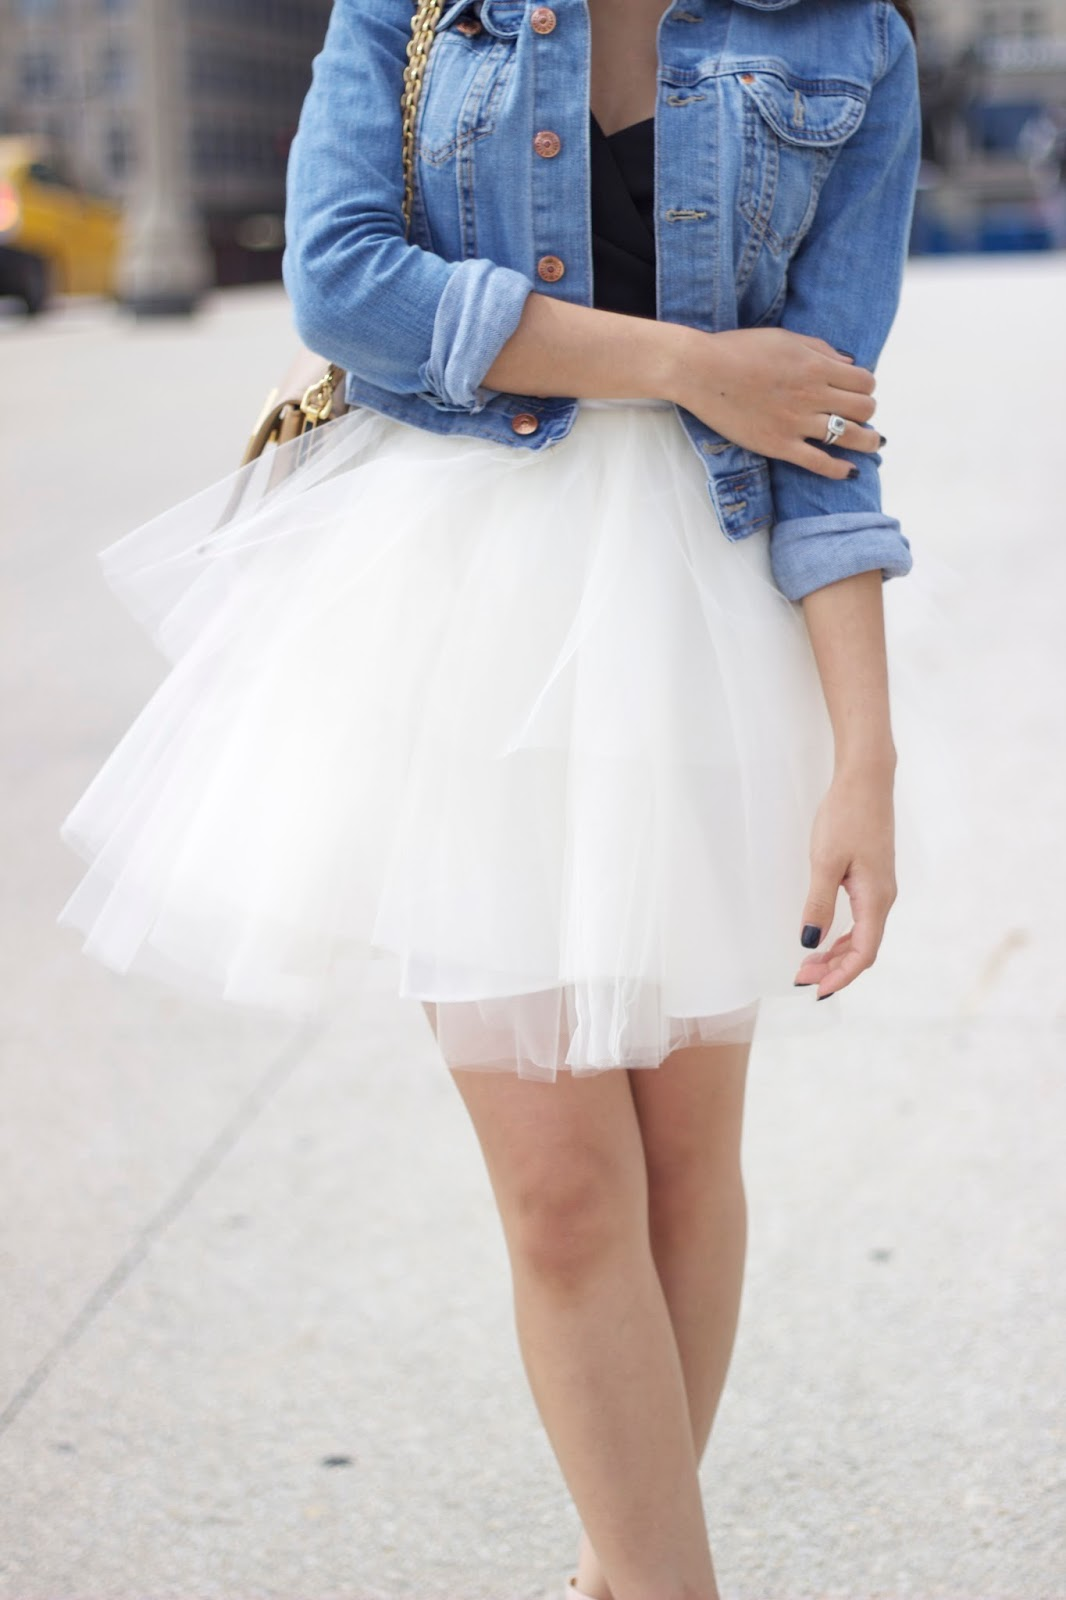 Tulle skirts, tutu skirts, fashion blogger, melba nguyen, tulle skirt pairing, fendi purse , styling skirts